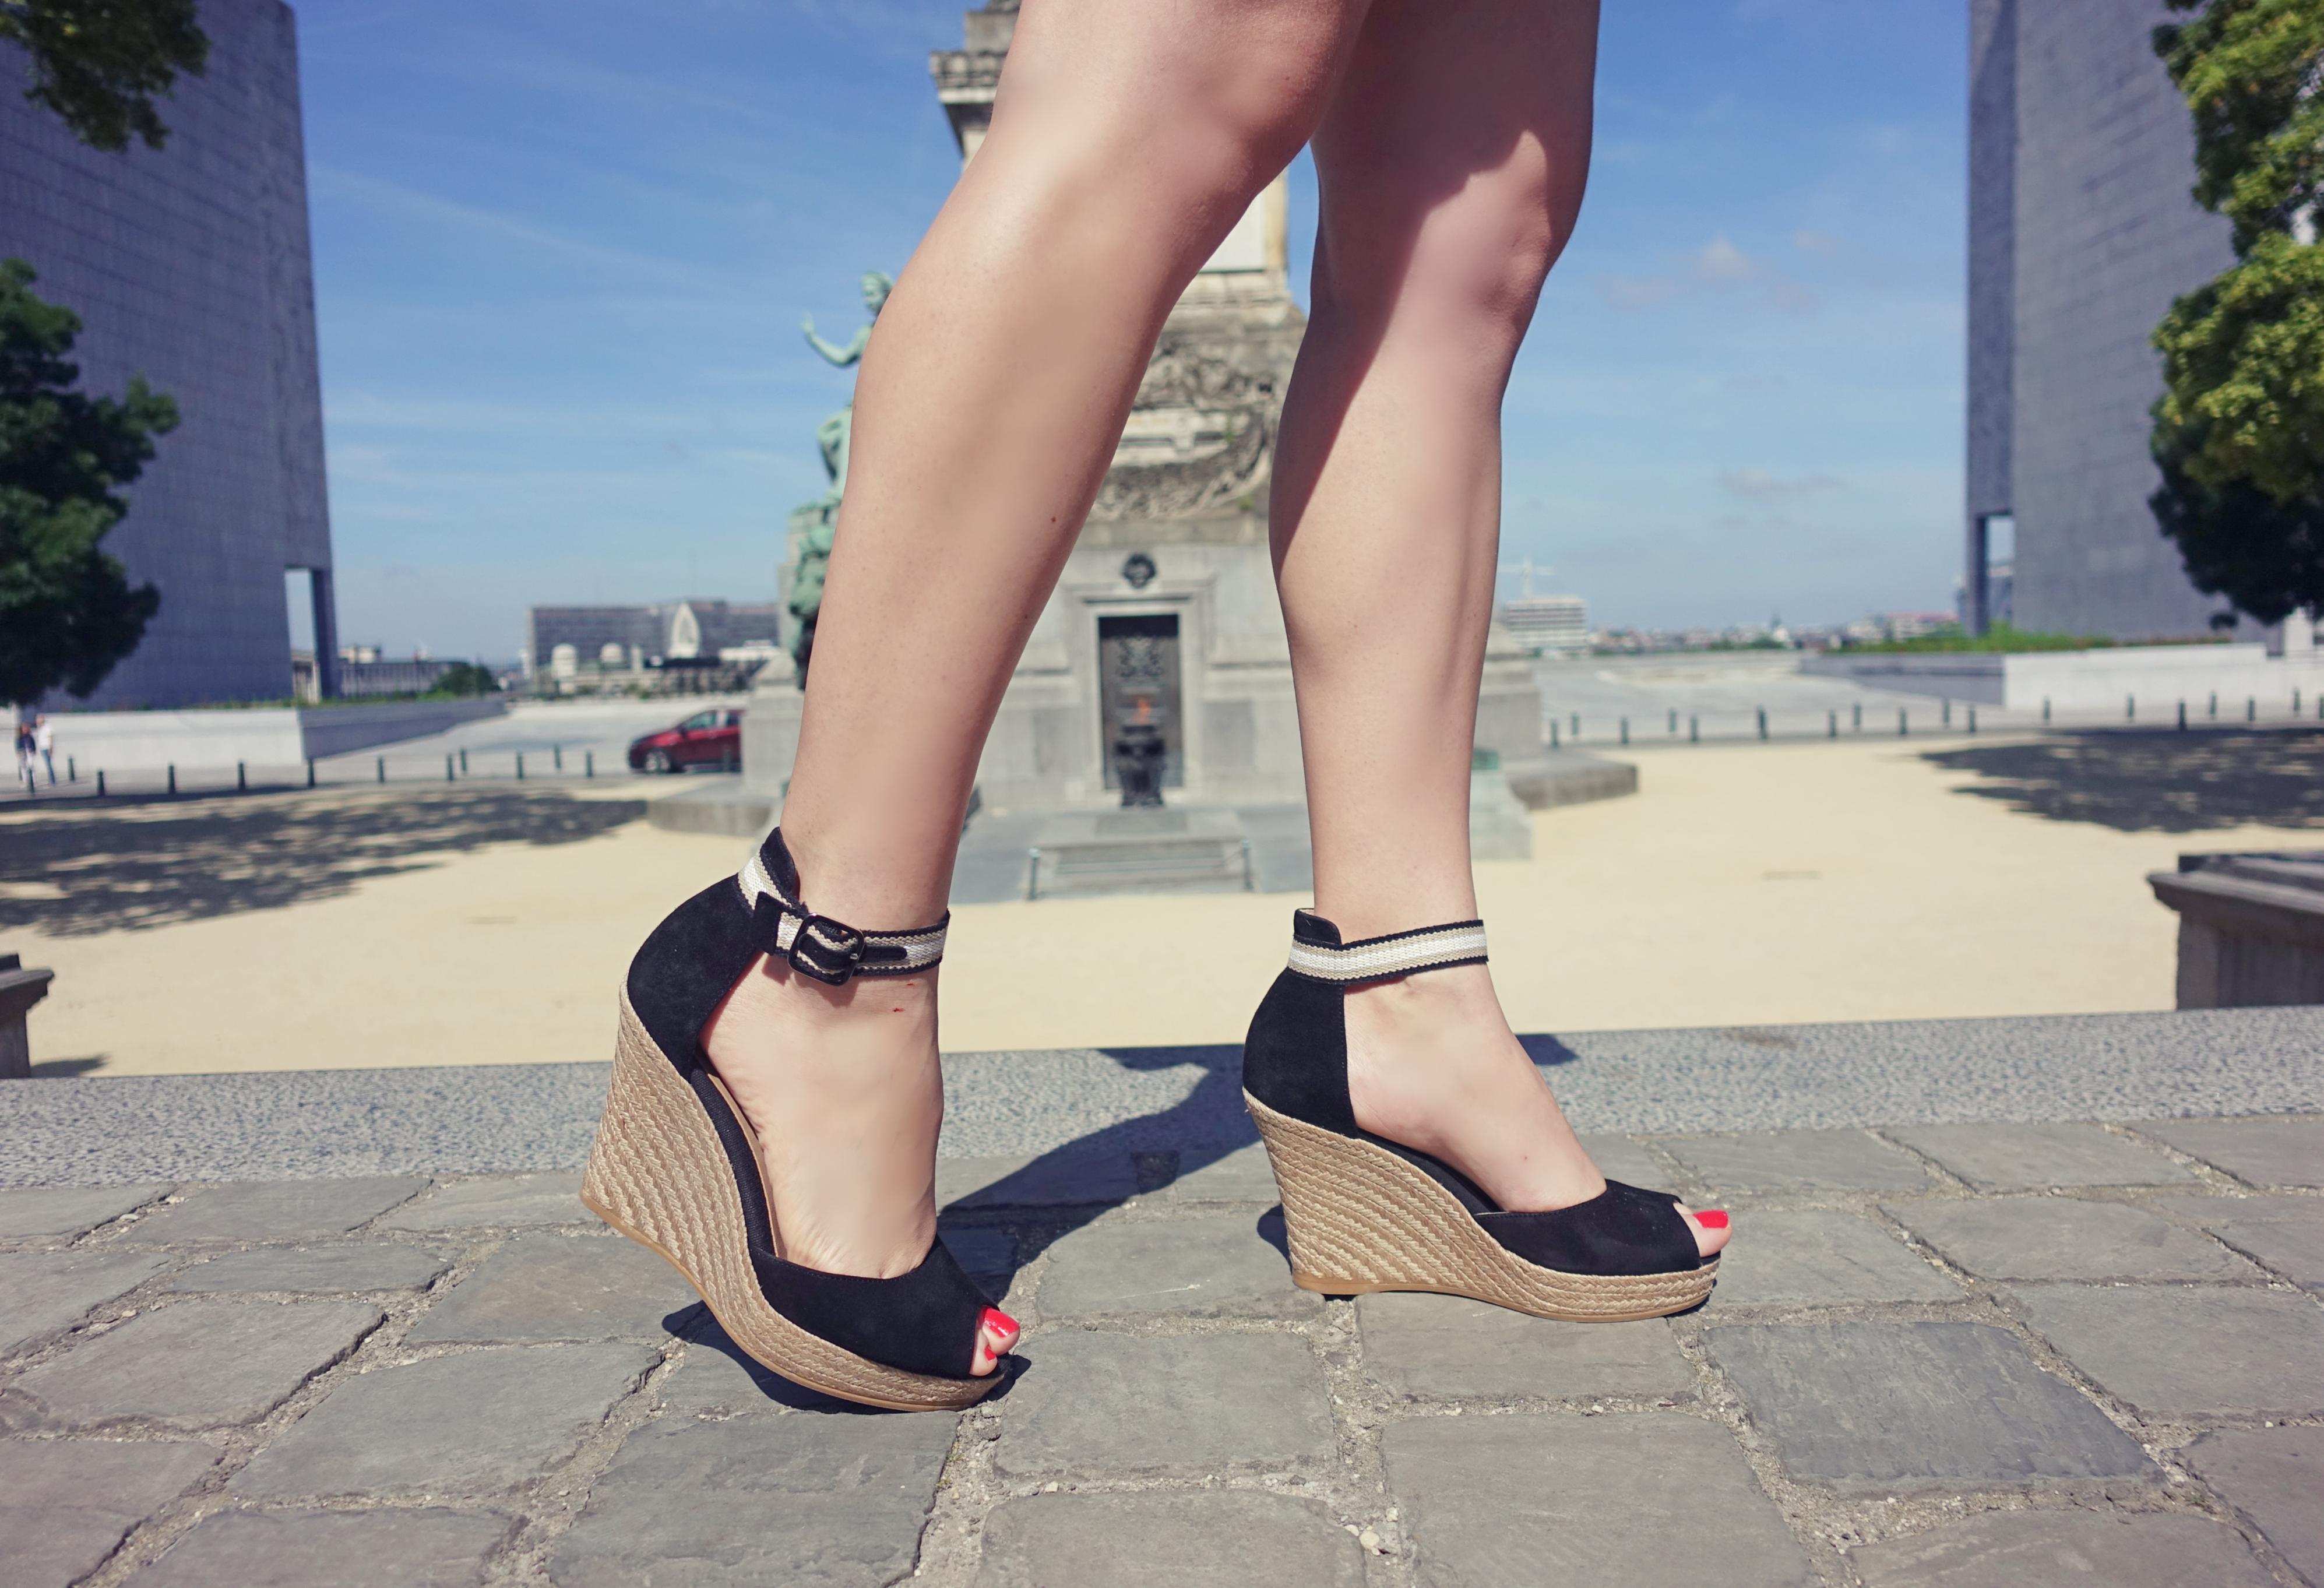 Sandalias-Toni-pons-blog-de-moda-ChicAdicta-influencer-fashionista-PiensaenChic-sandals-summer18-cunas-negras-Piensa-en-Chic-Chic-adicta